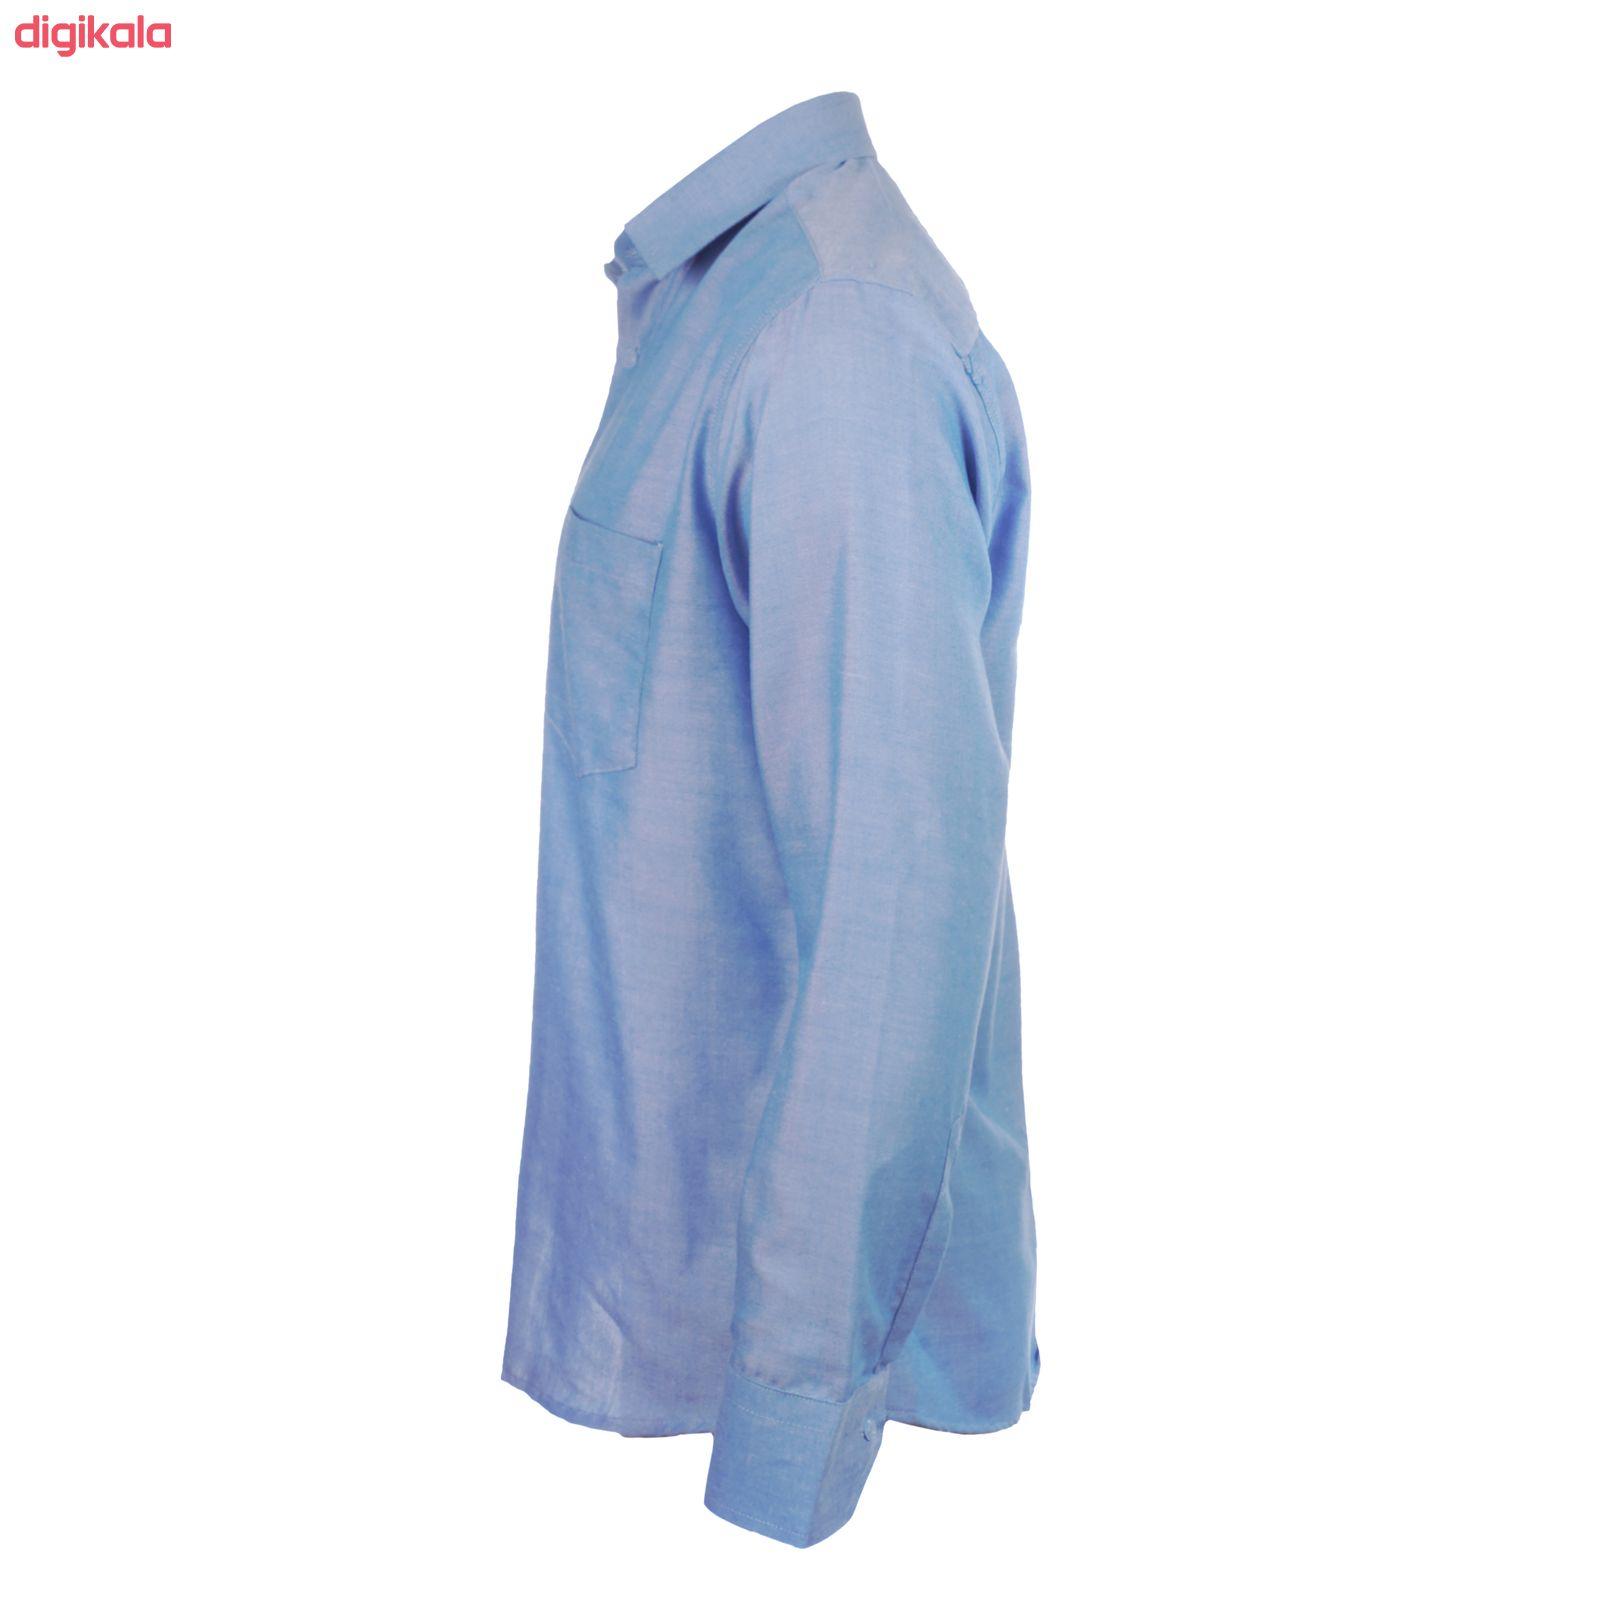 پیراهن آستین بلند مردانه ناوالس مدل Pk3-8020-BL main 1 2